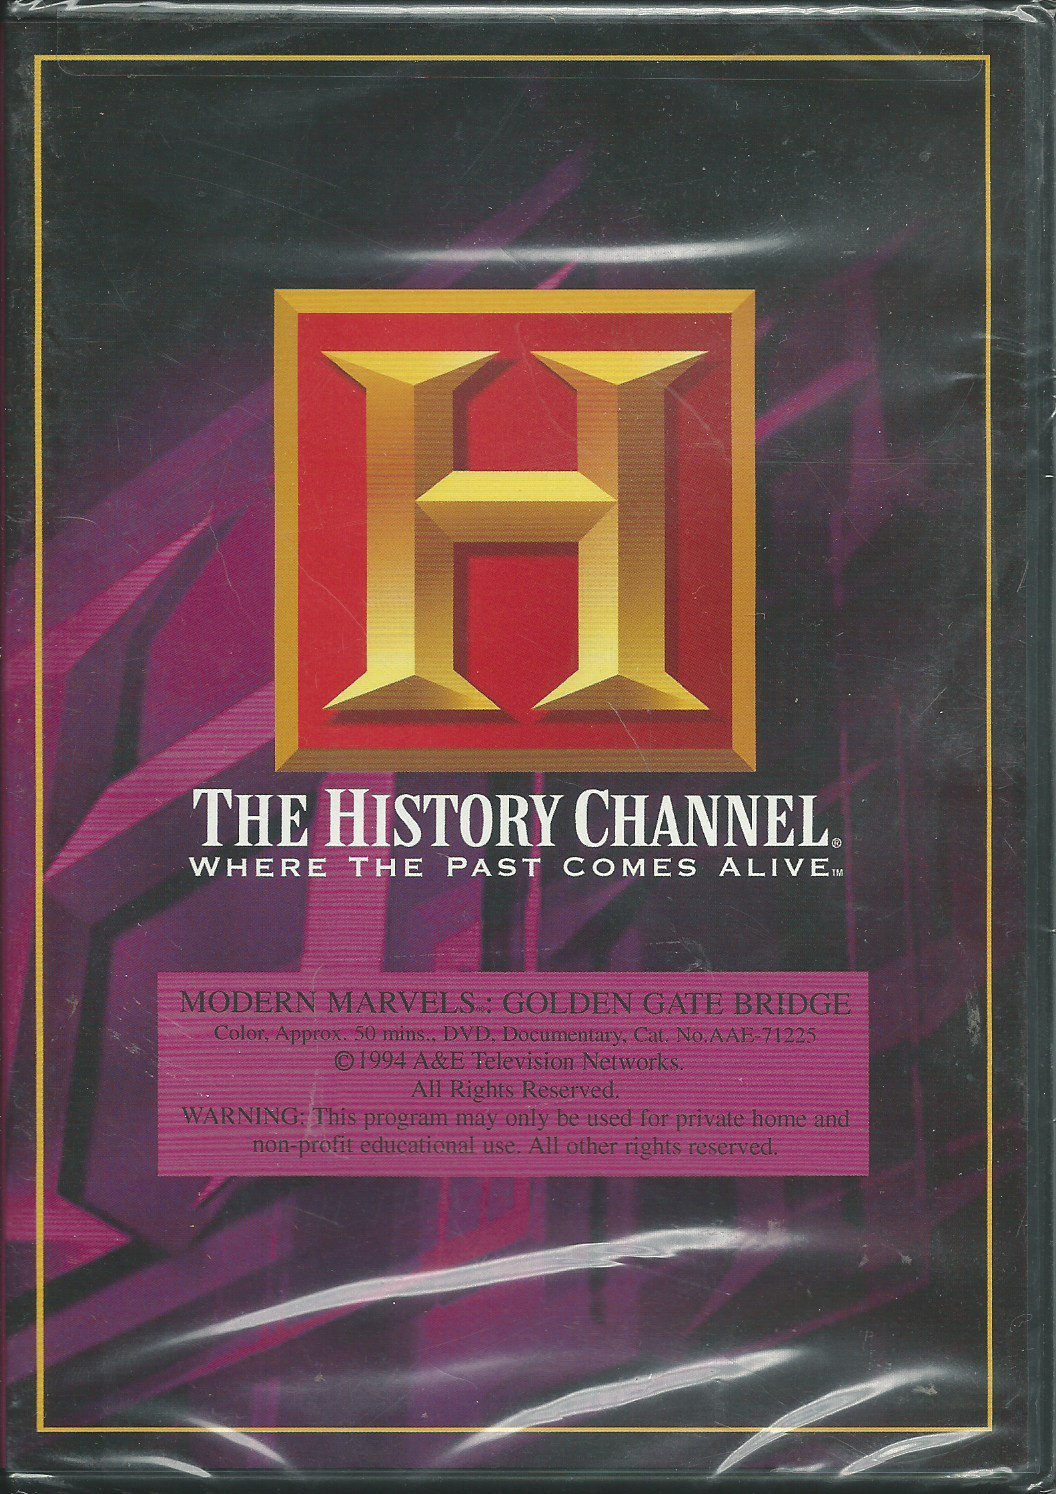 Modern Marvels - Golden Gate Bridge (A&E DVD Archives)